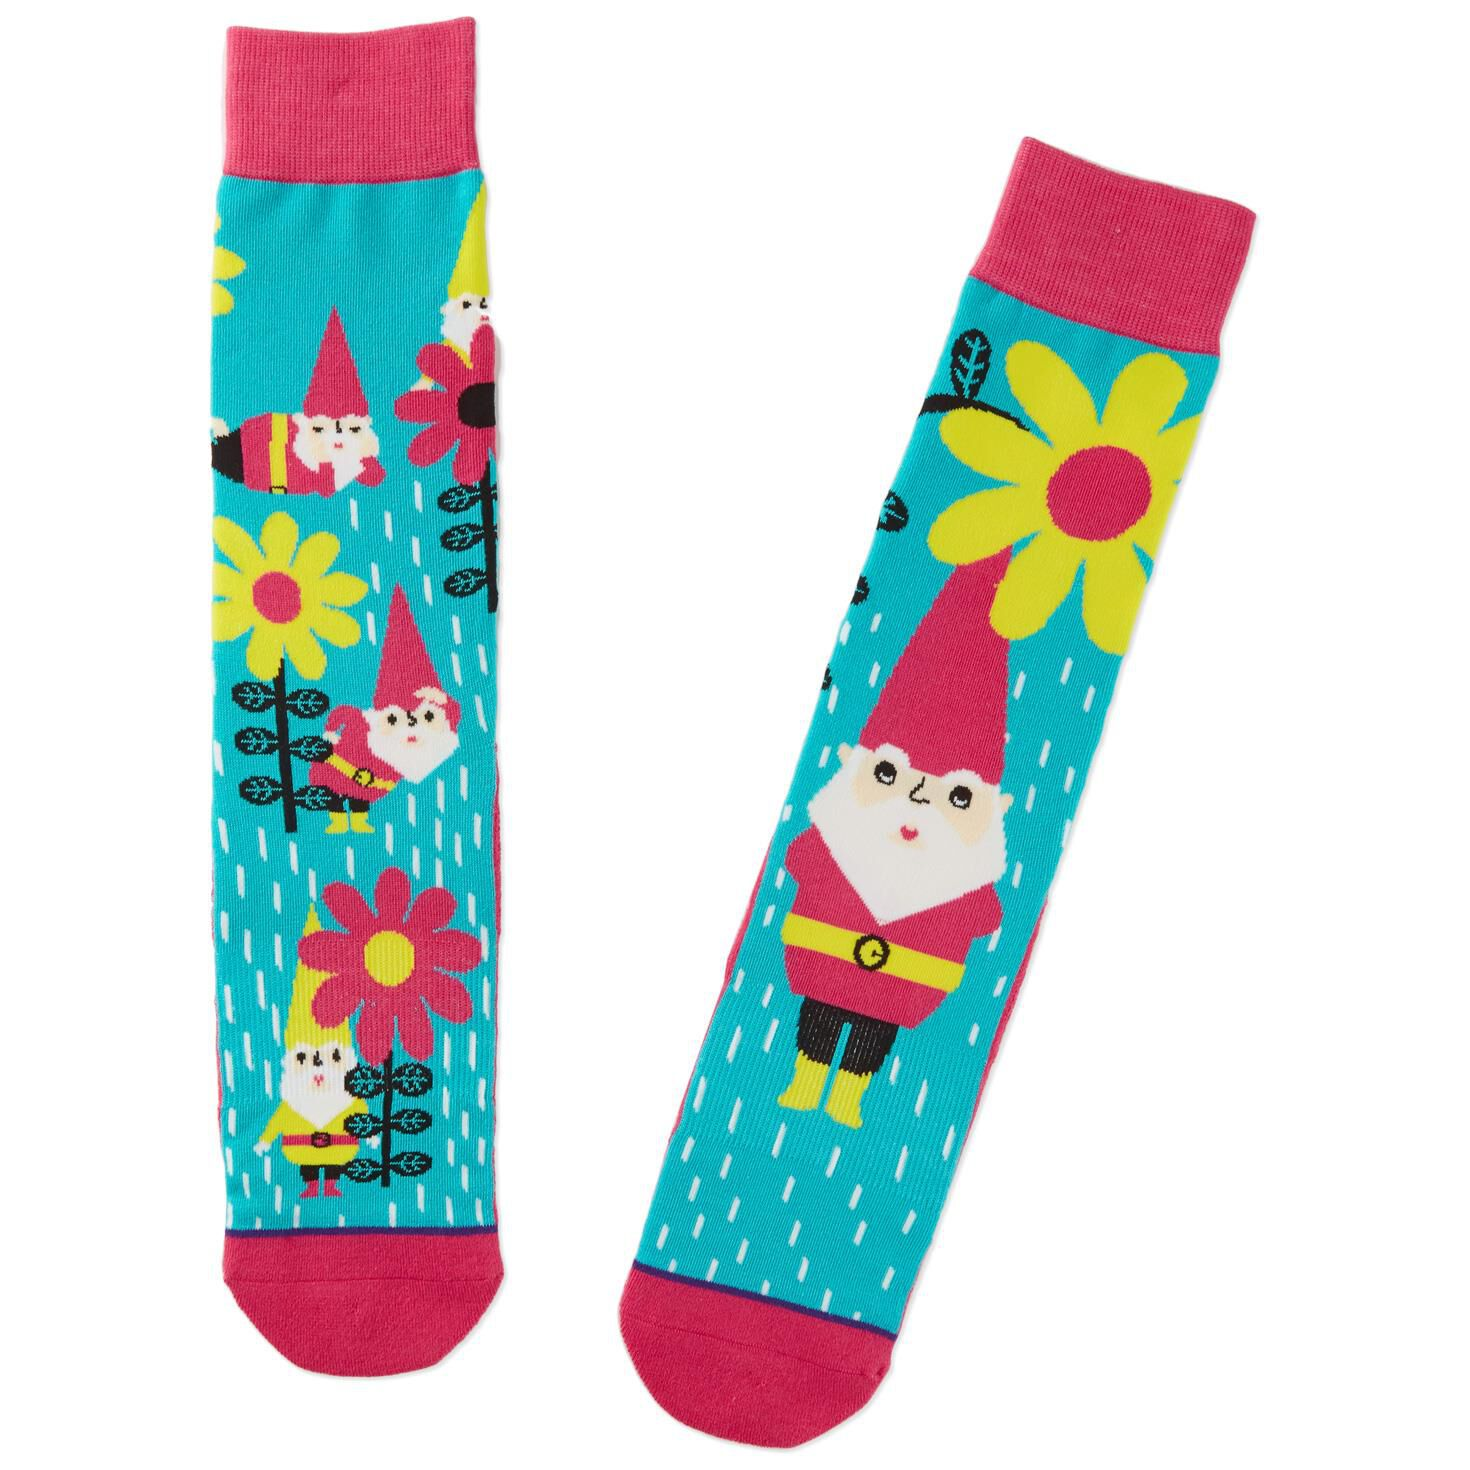 Garden socks witches garden sock collection shop latest for Garden socks